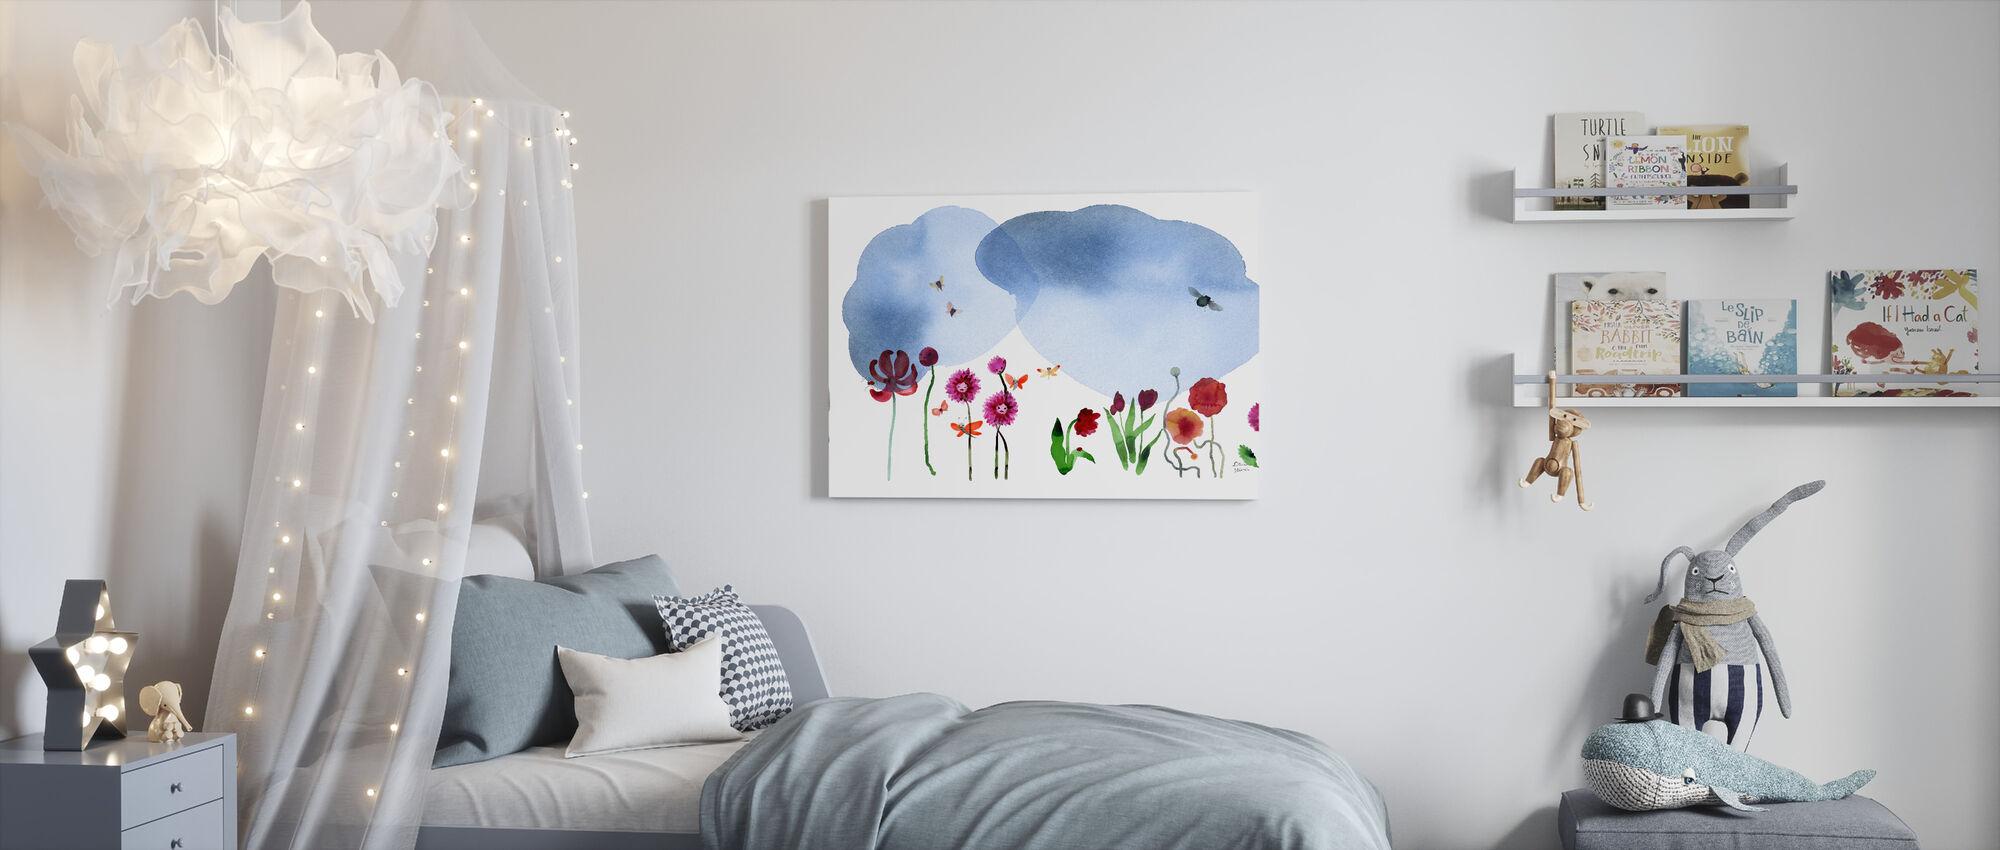 Water Kleur Bloemen II - Canvas print - Kinderkamer